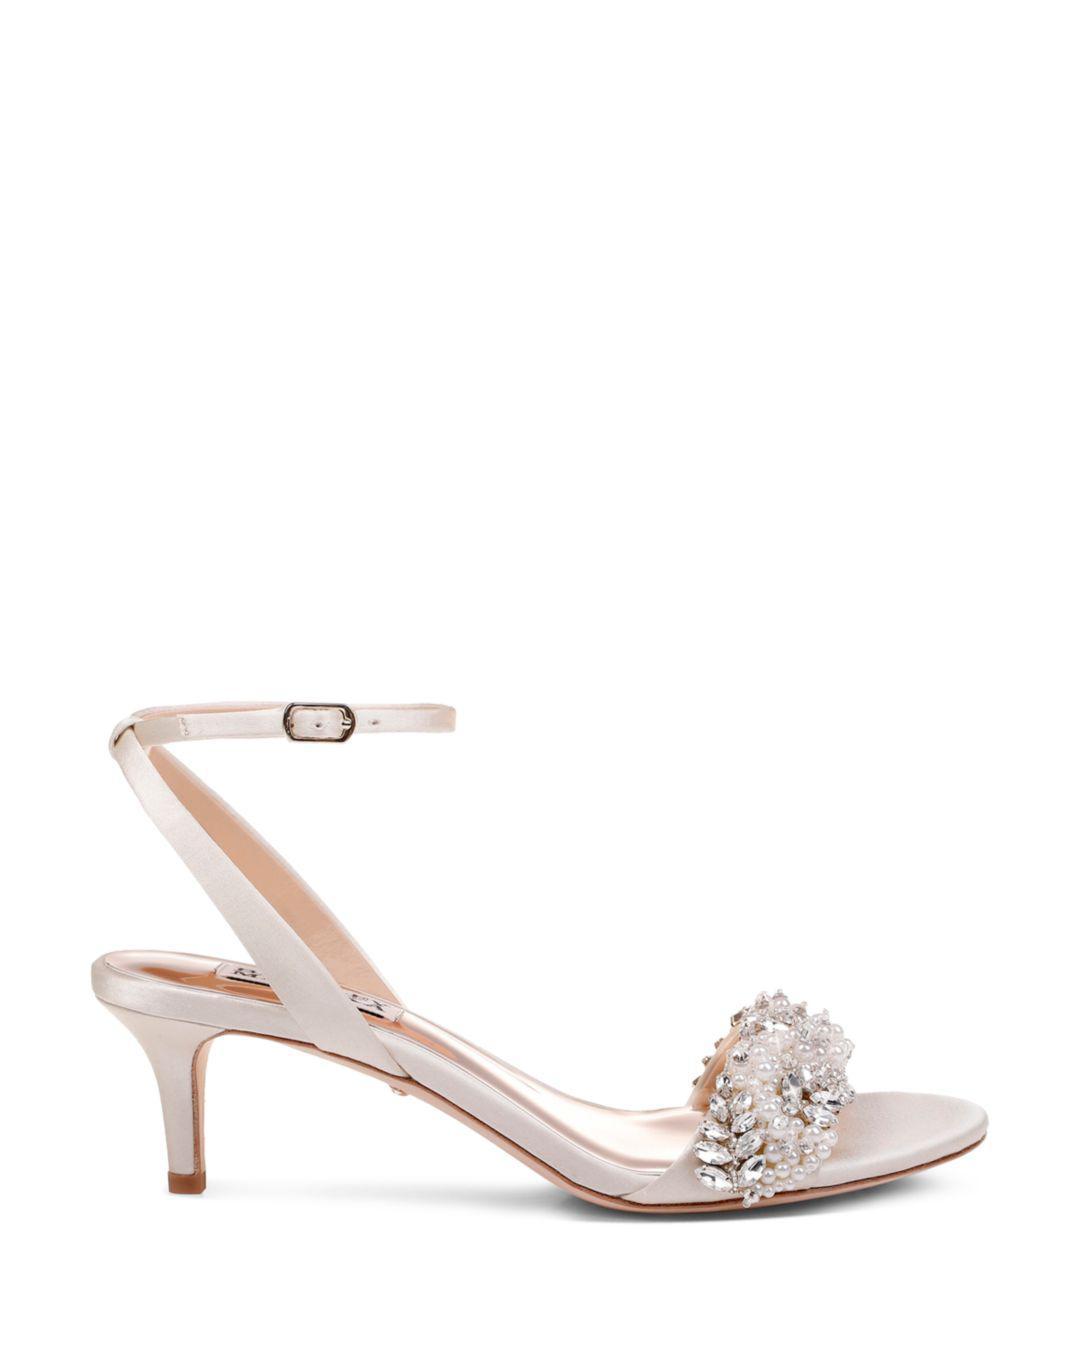 f89dd12a107e Lyst - Badgley Mischka Fiona Embellished Satin Kitten-heel Sandals in White